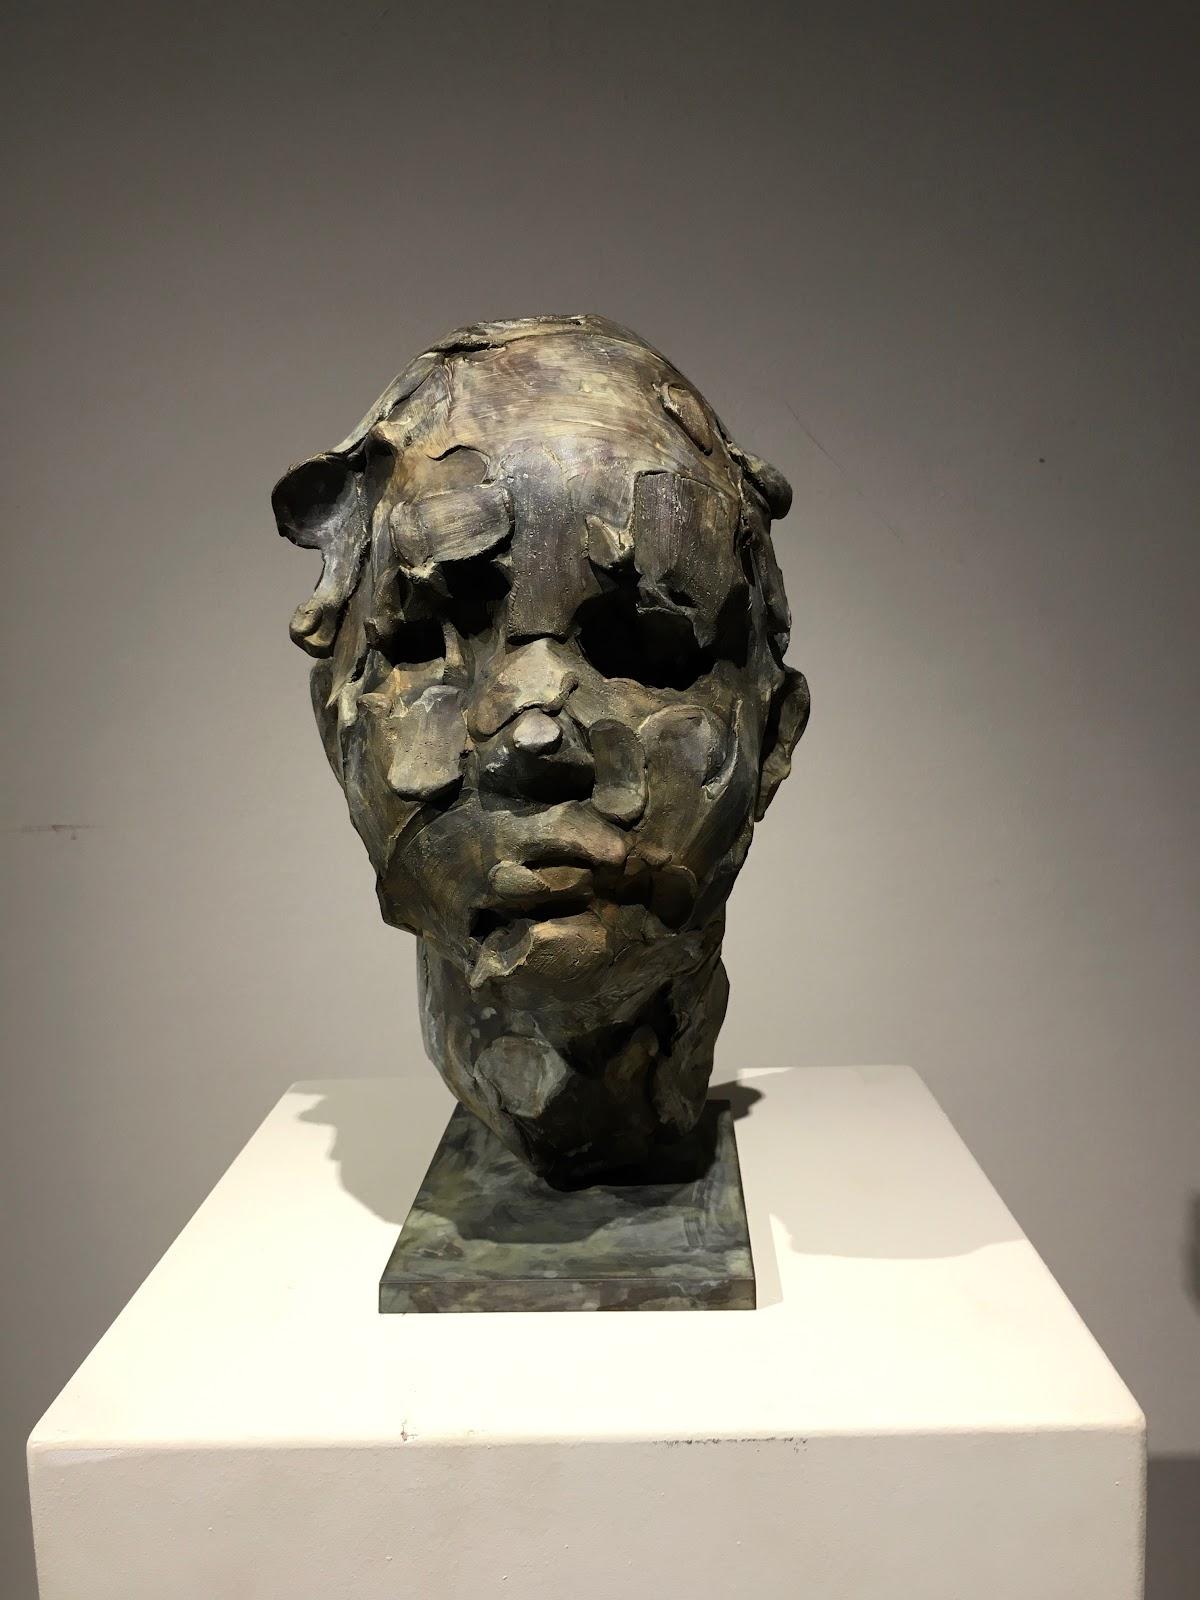 Le Kid 30 cm Catherine Thiry sculpture bronze contemporarysculpture sculpturecontemporaine belgium lasne artiste belge sculpteur  .jpg